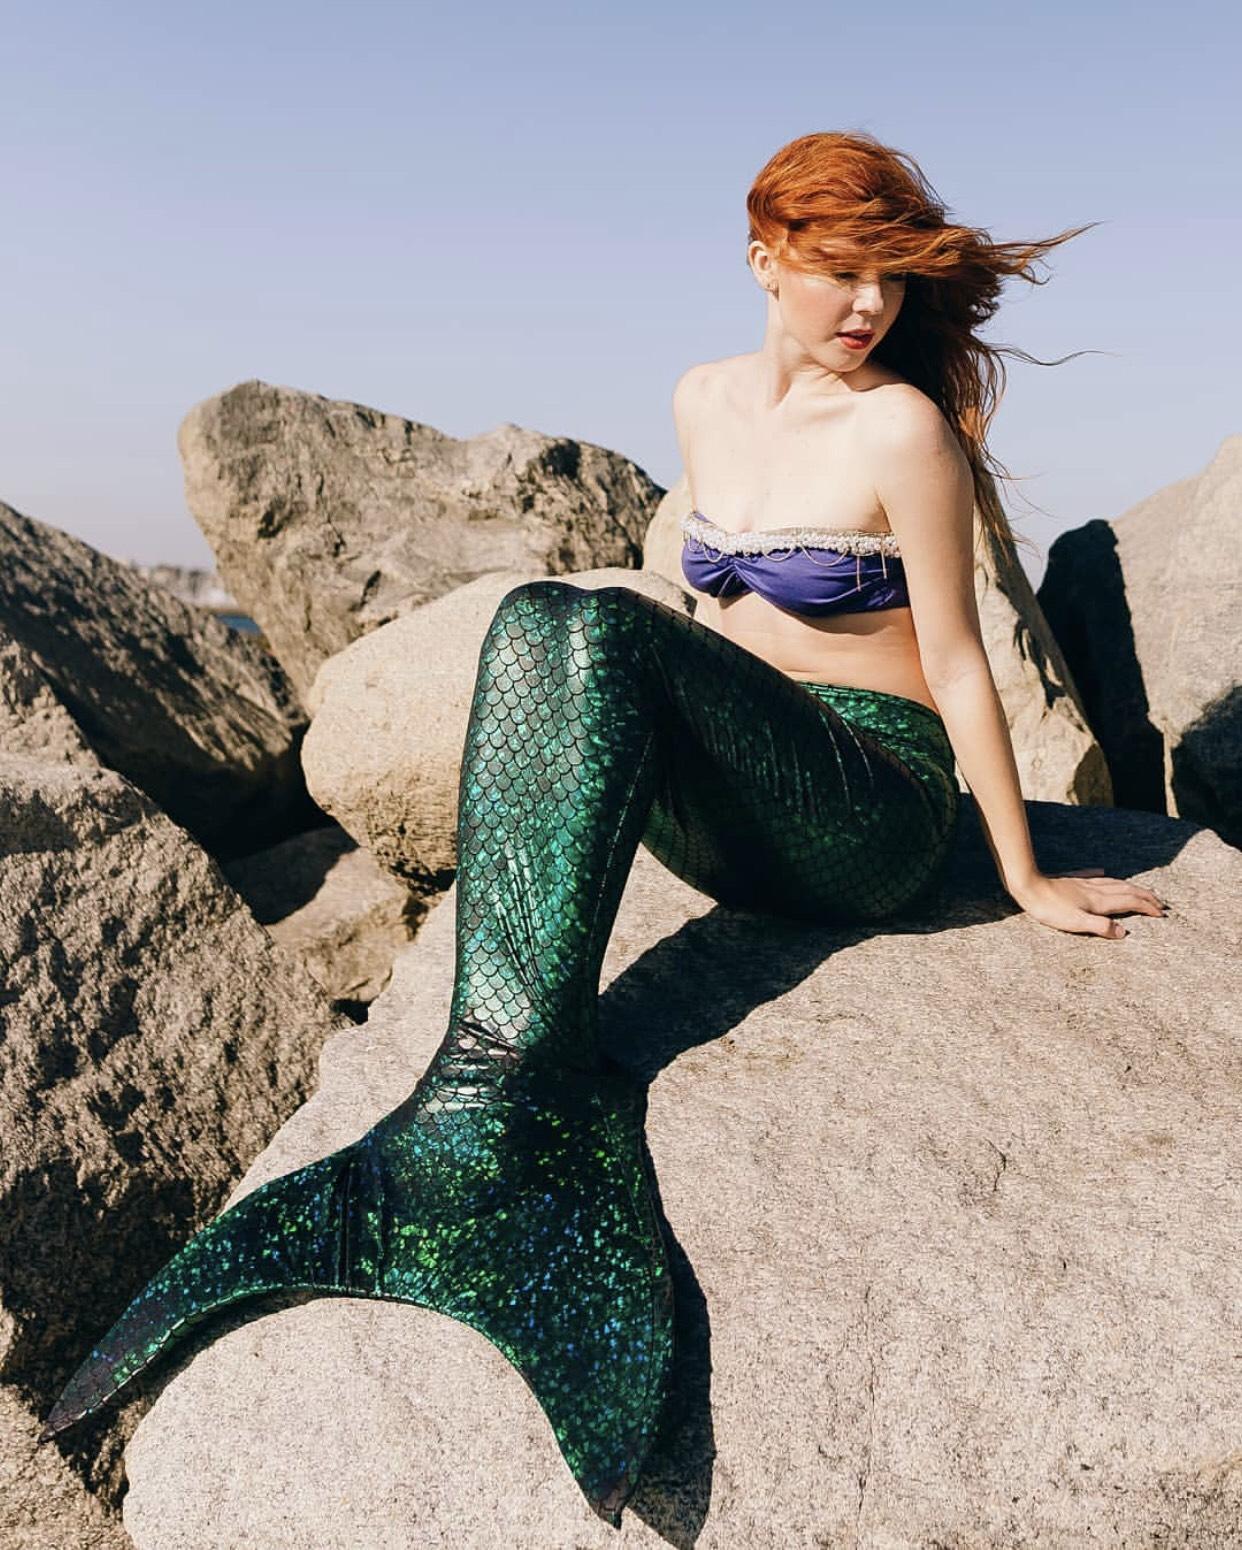 SWIMBRAYV x Secretly a Mermaid - PHOTOGRAPHY BY TIFFANY MANSOUR NON-PROFIT & CLOTHING BRAND SPONSORSHIP